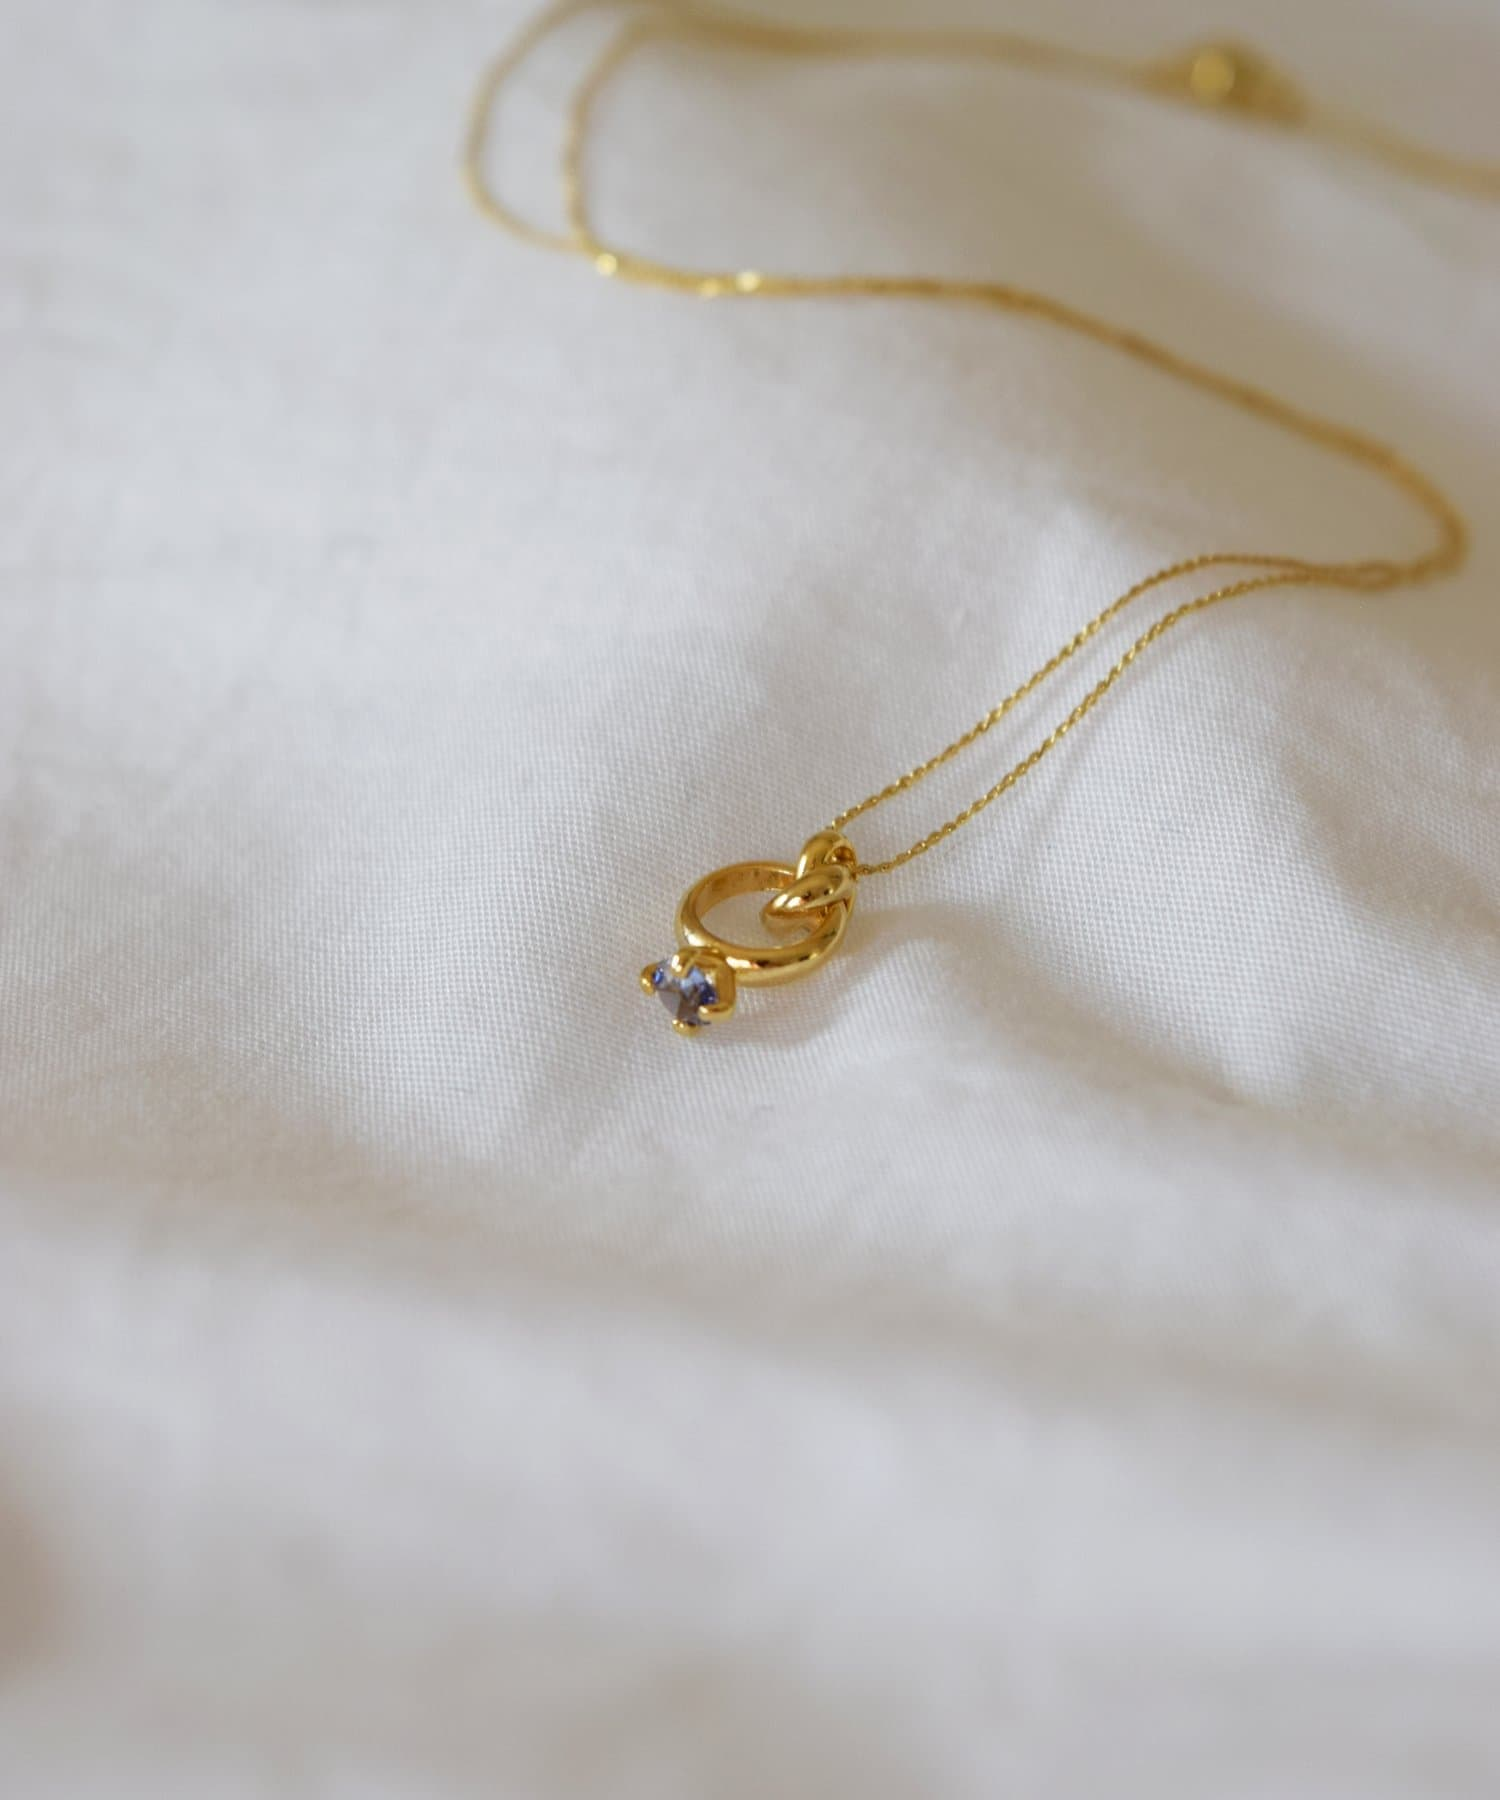 BIRTHDAY BAR(バースデイバー) レディース Birthstone Petit Ring Necklace 誕生石ネックレス オフホワイト